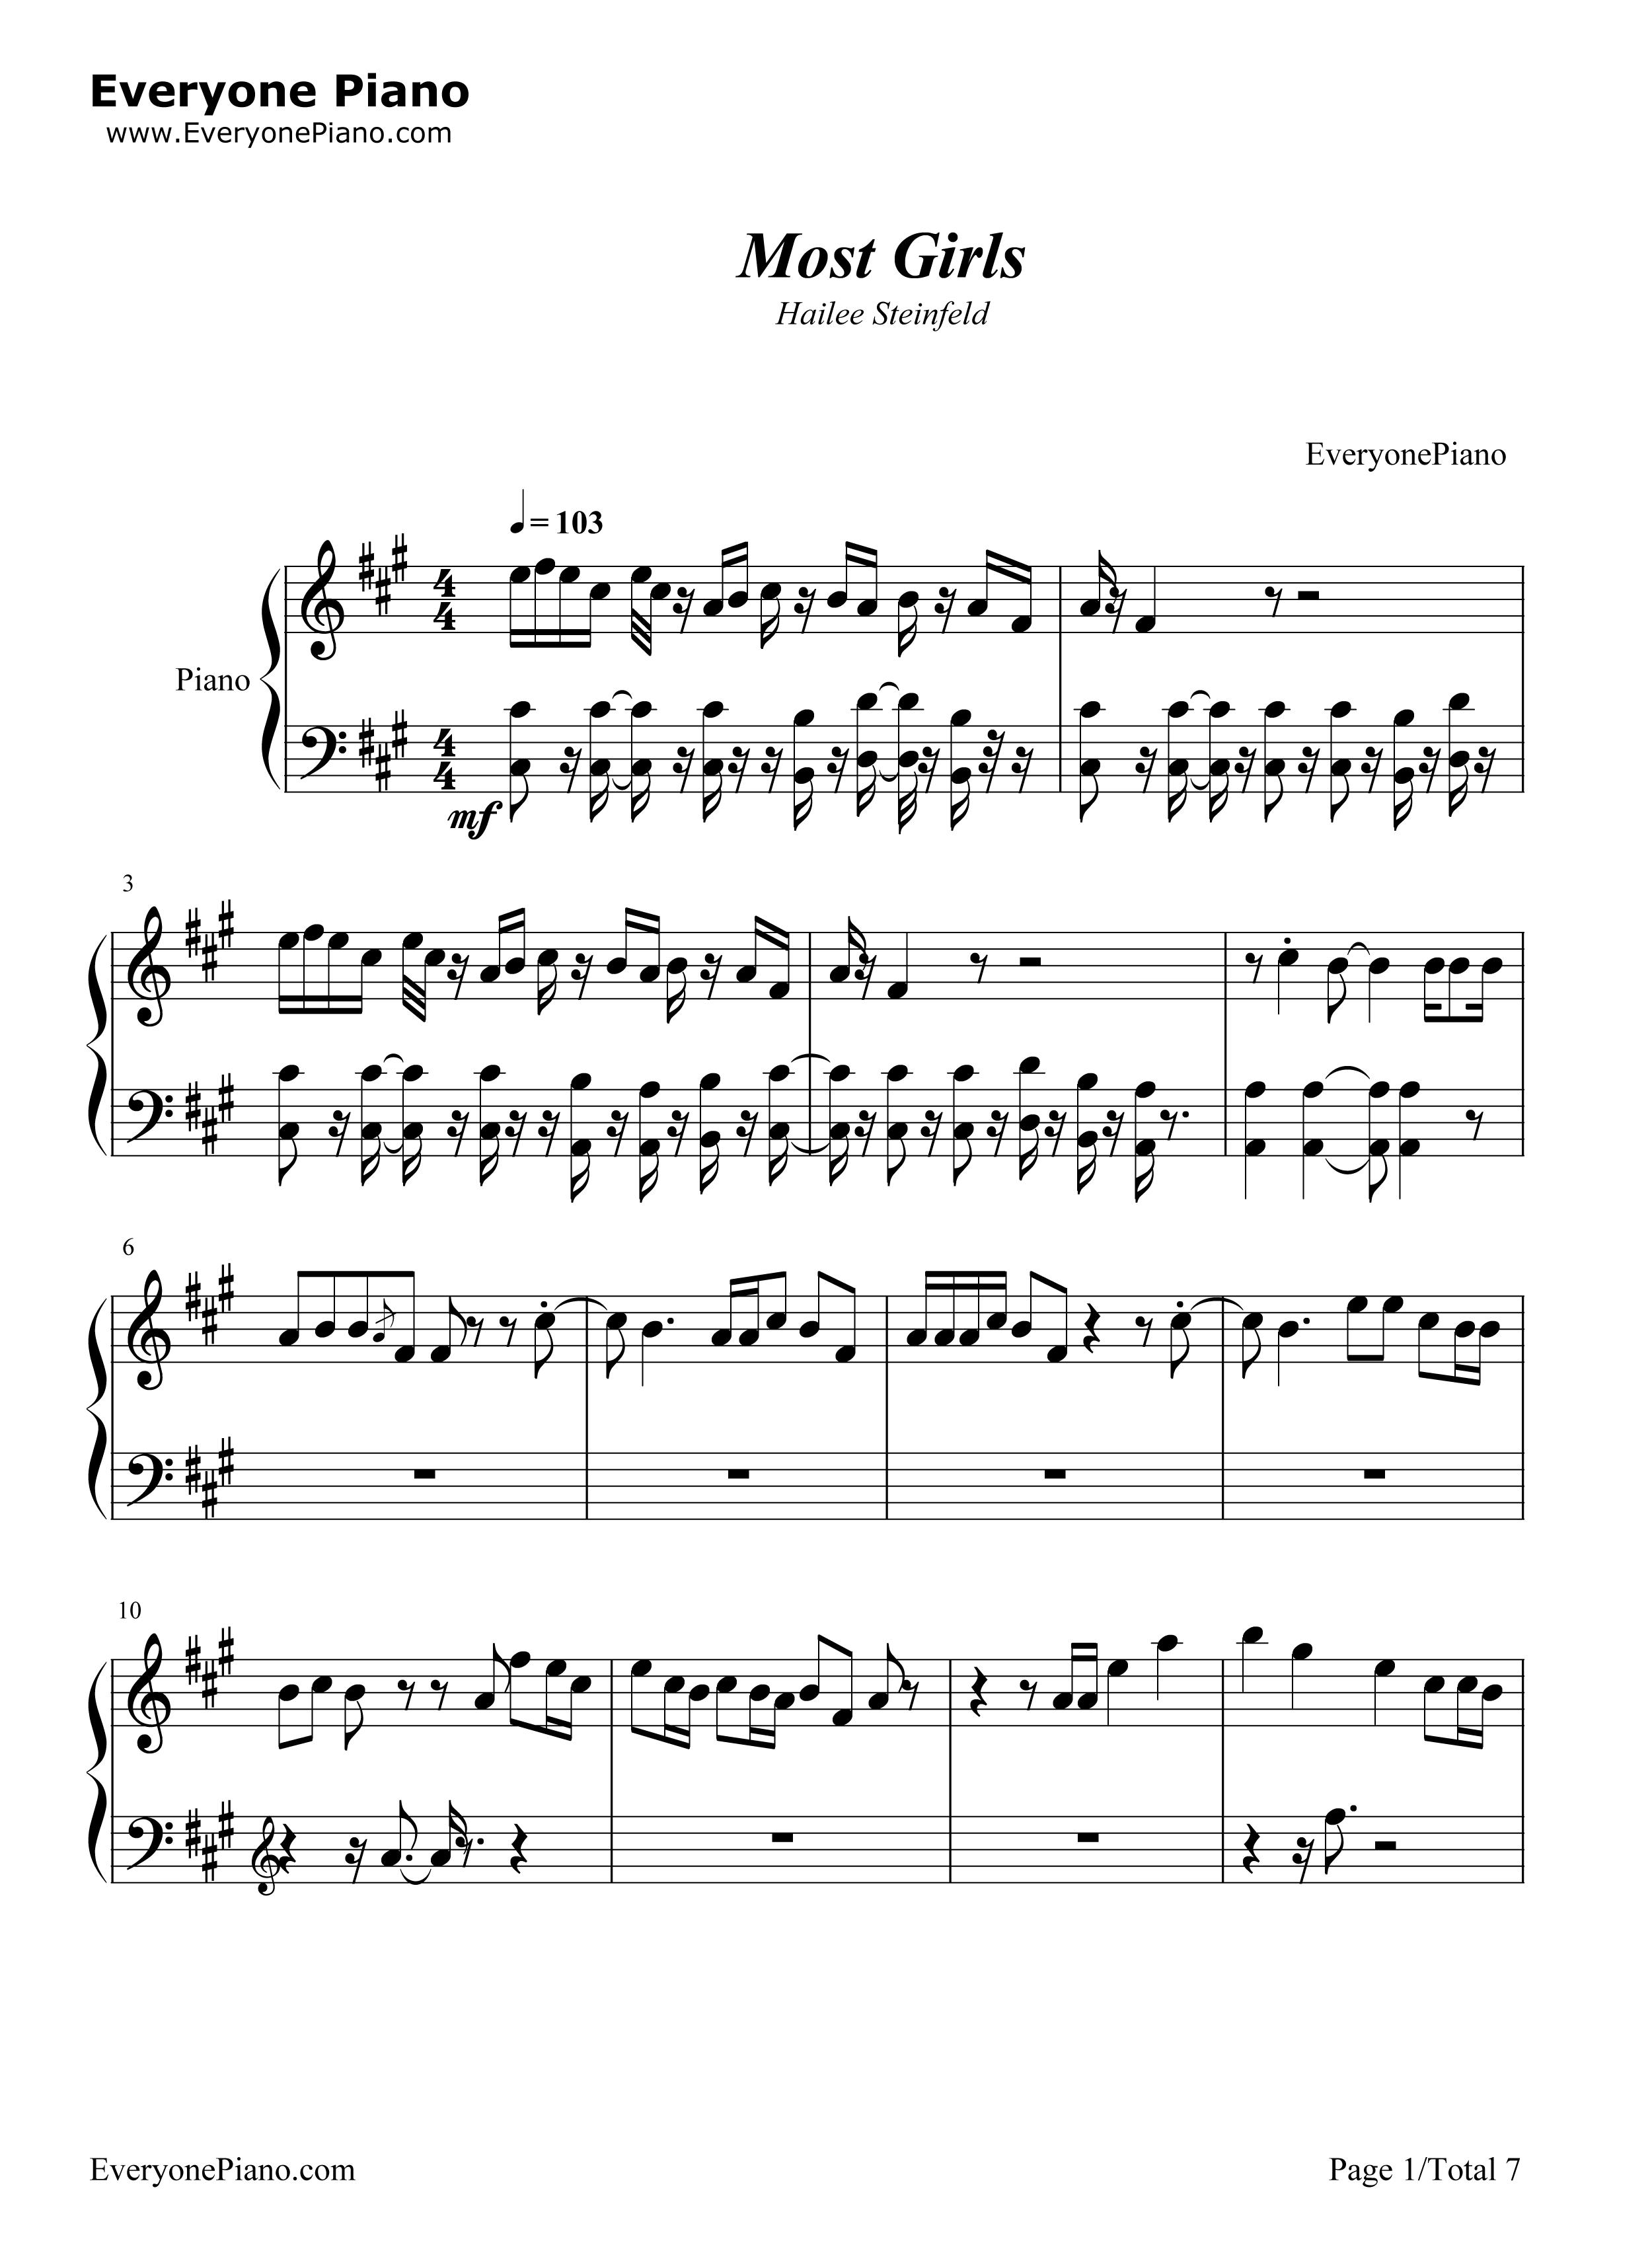 Most Girls-Hailee Steinfeld Free Piano Sheet Music & Piano